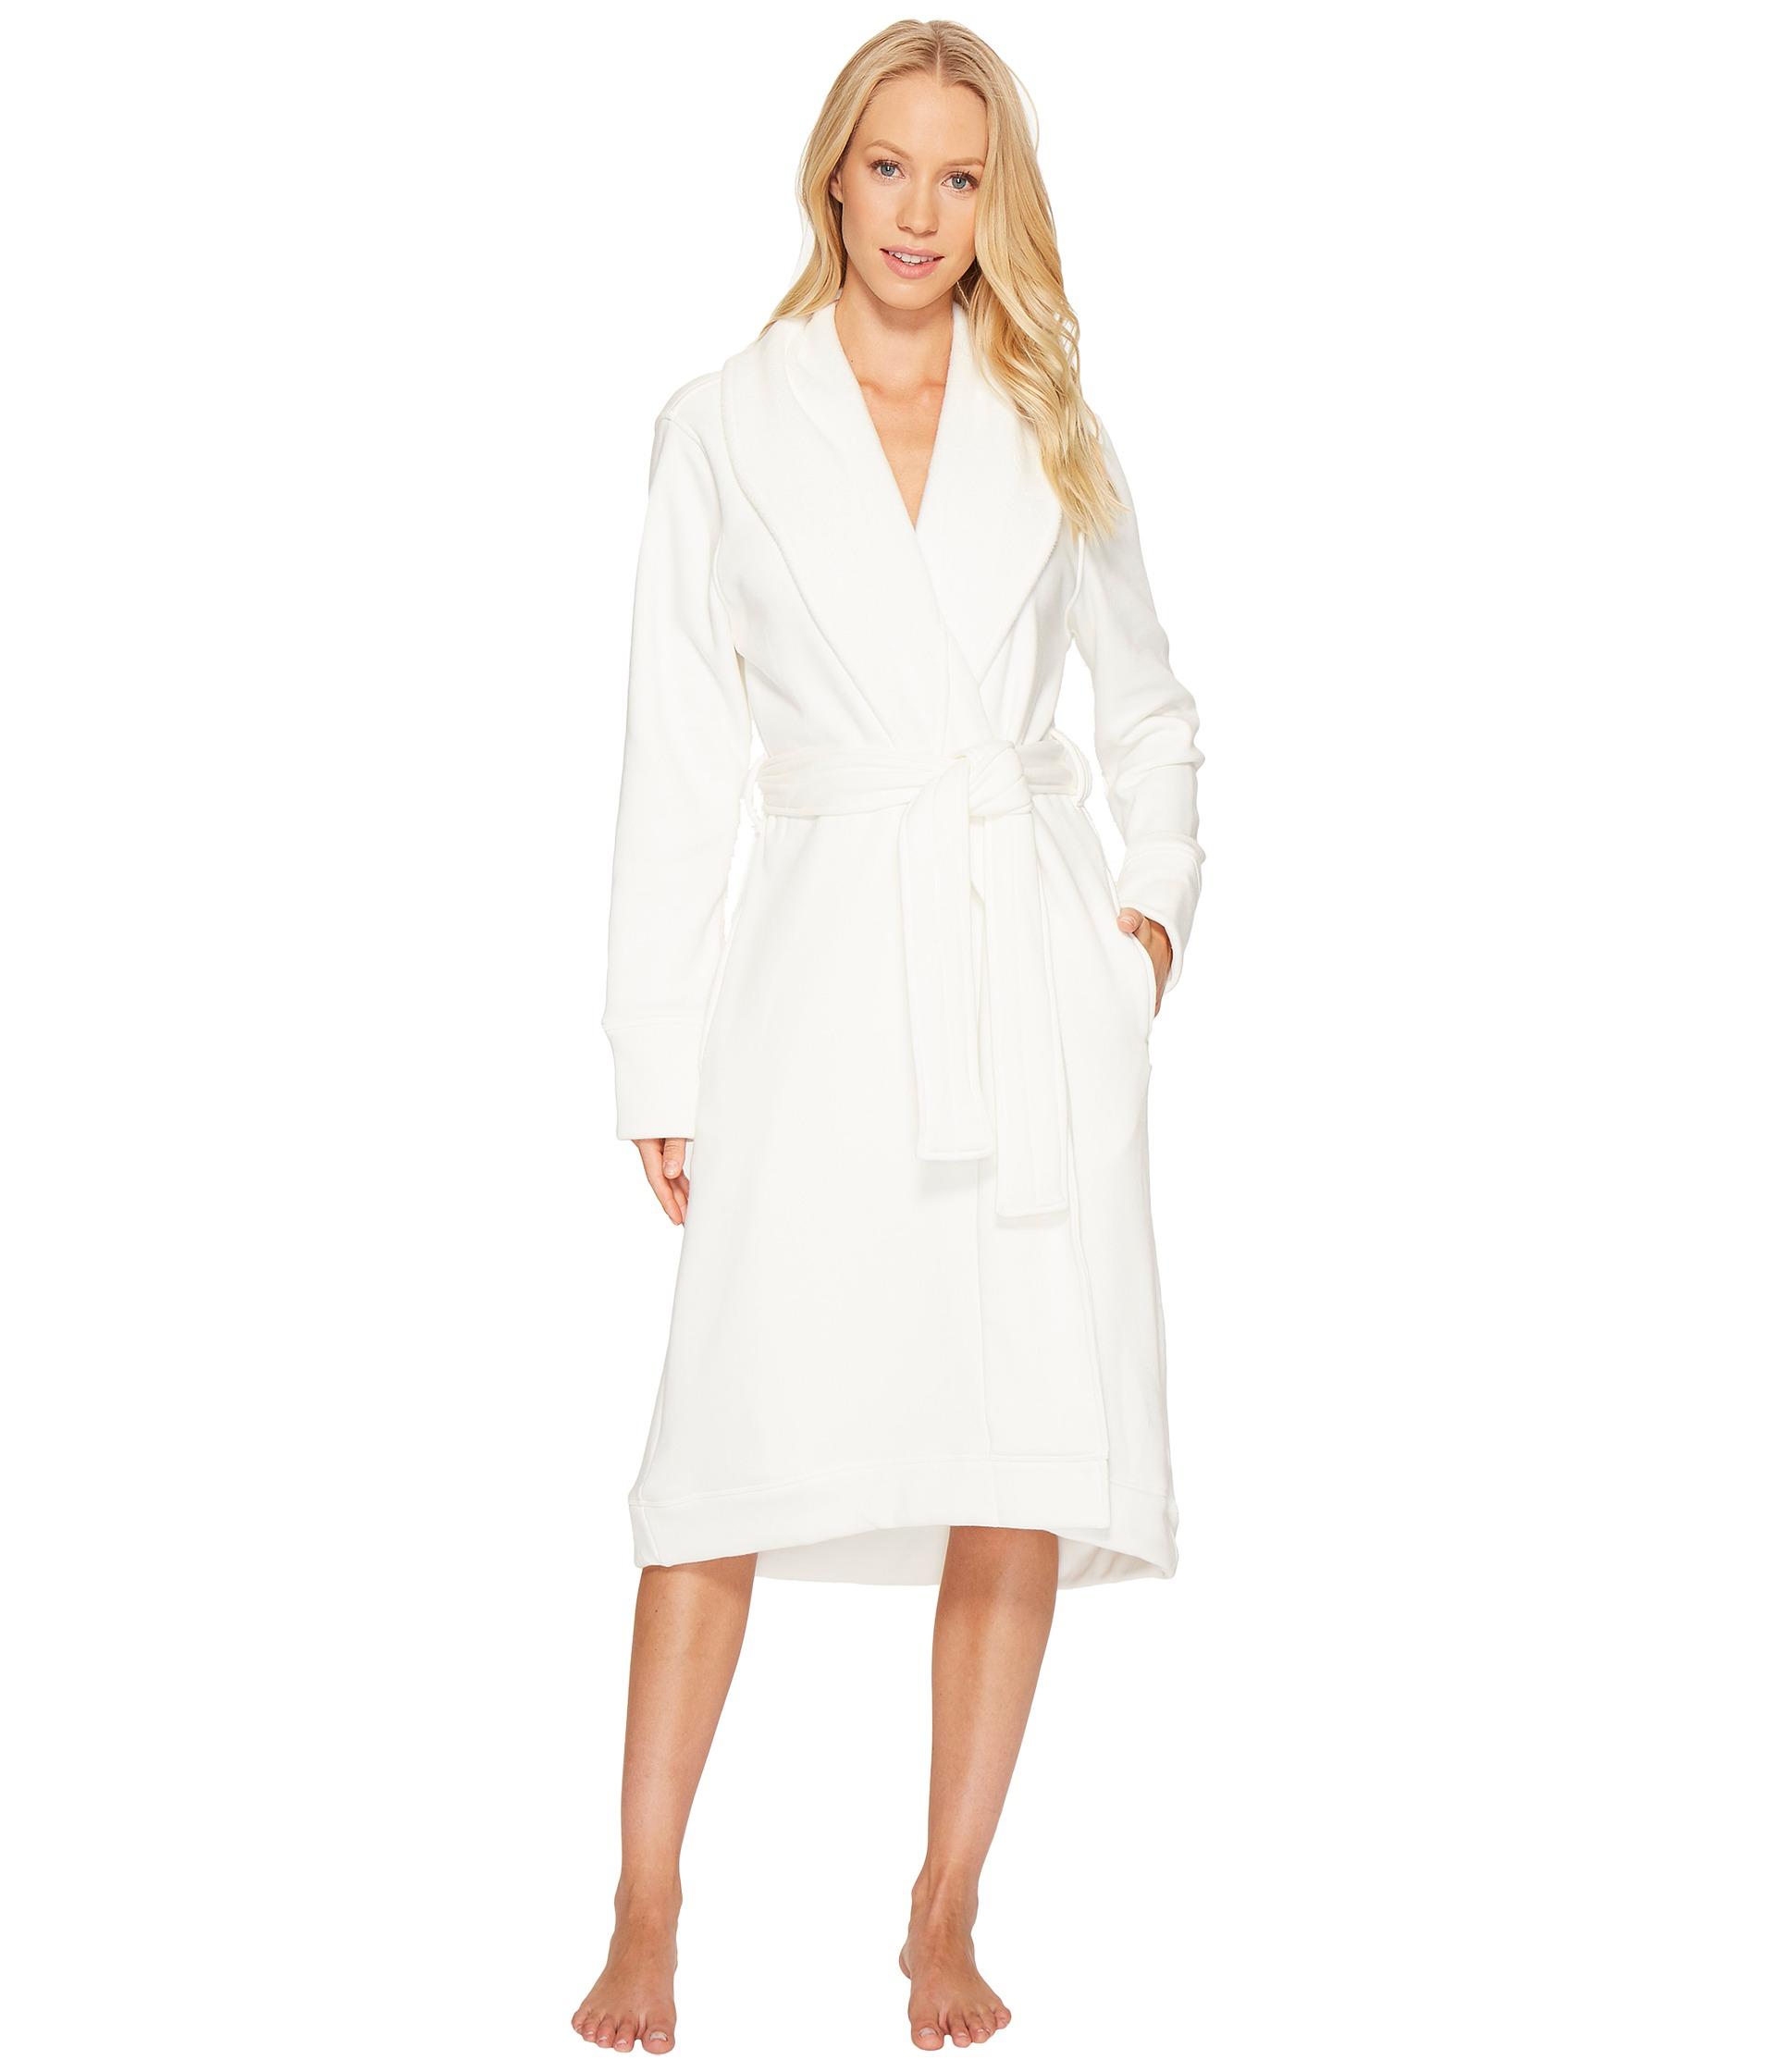 f60d1365e8 Ugg Duffield Robe